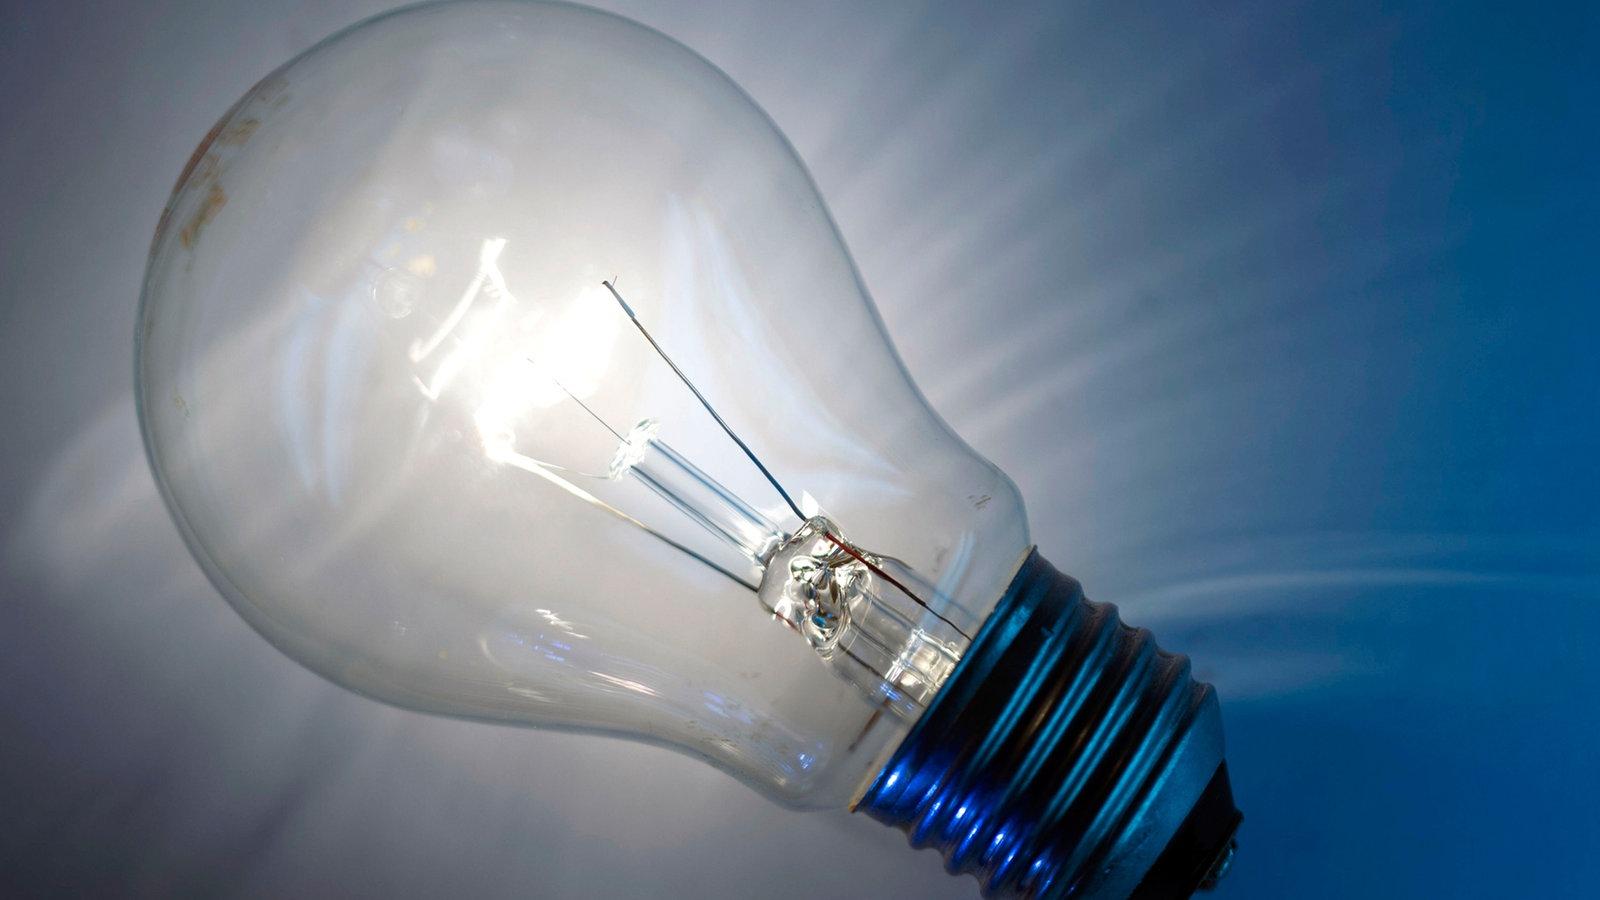 elektrizit t edison energie technik planet wissen. Black Bedroom Furniture Sets. Home Design Ideas